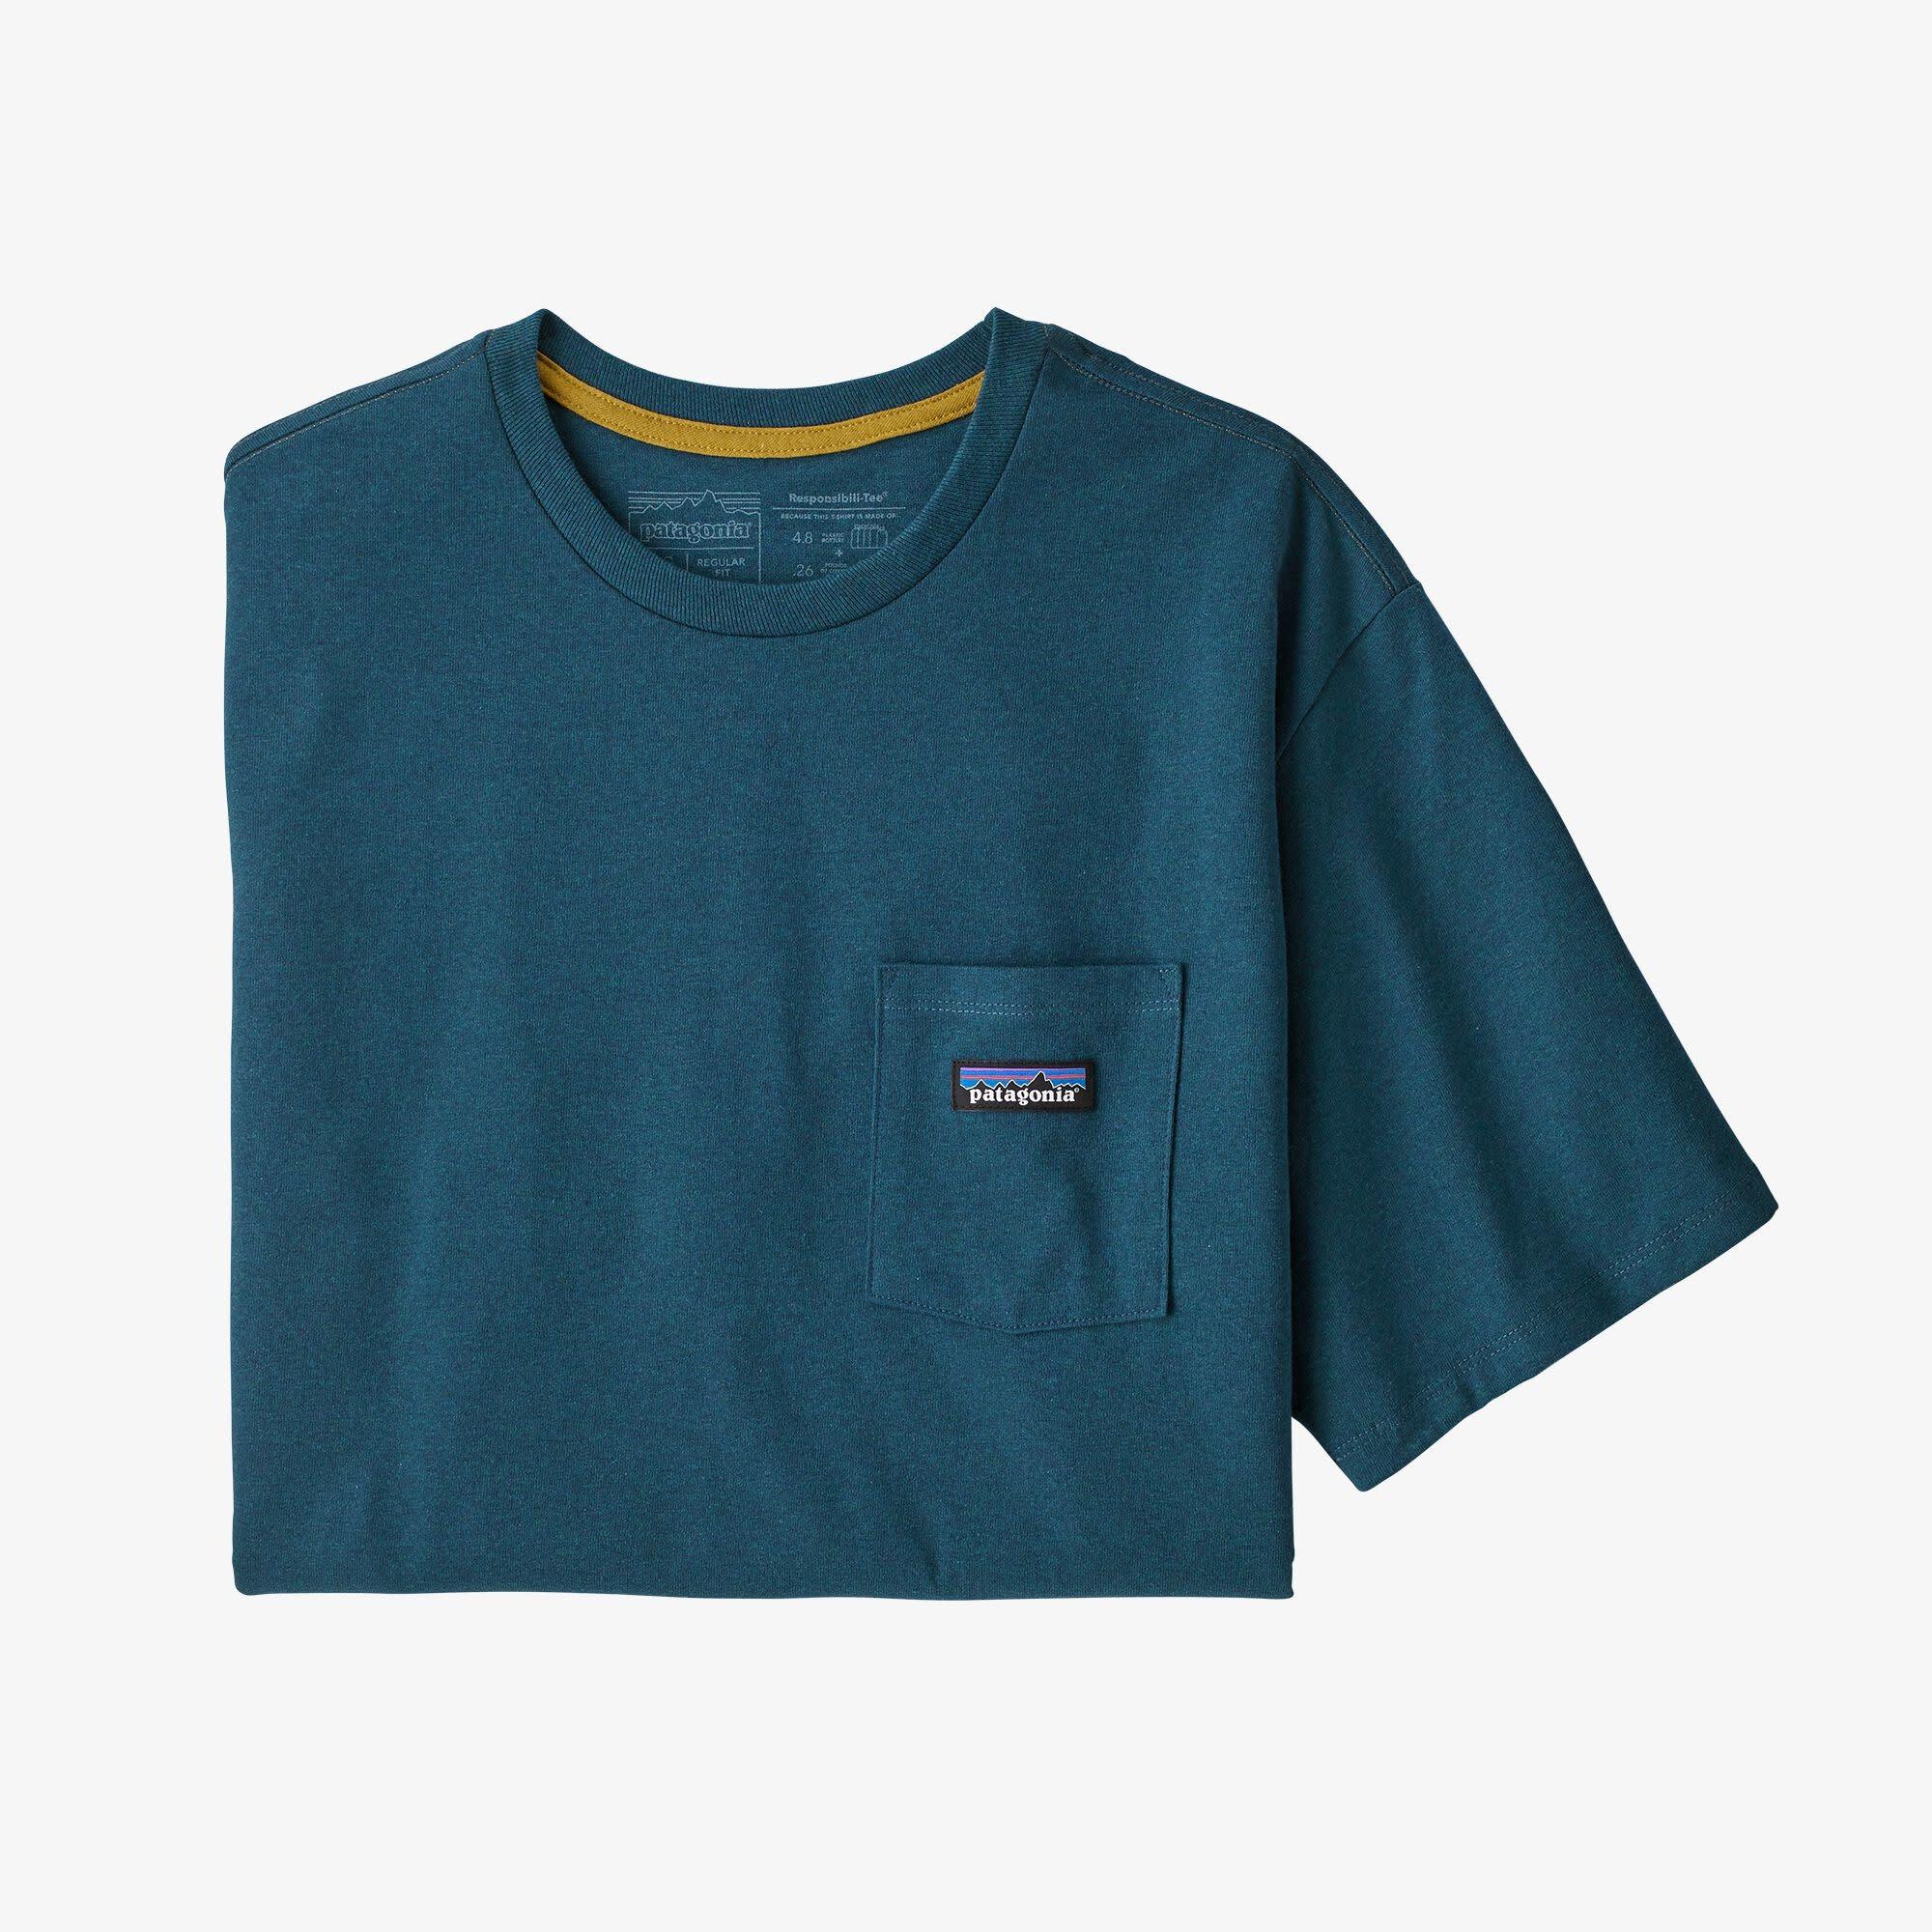 Patagonia Patagonia Men's P-6 Label Pocket Responsibili-Tee